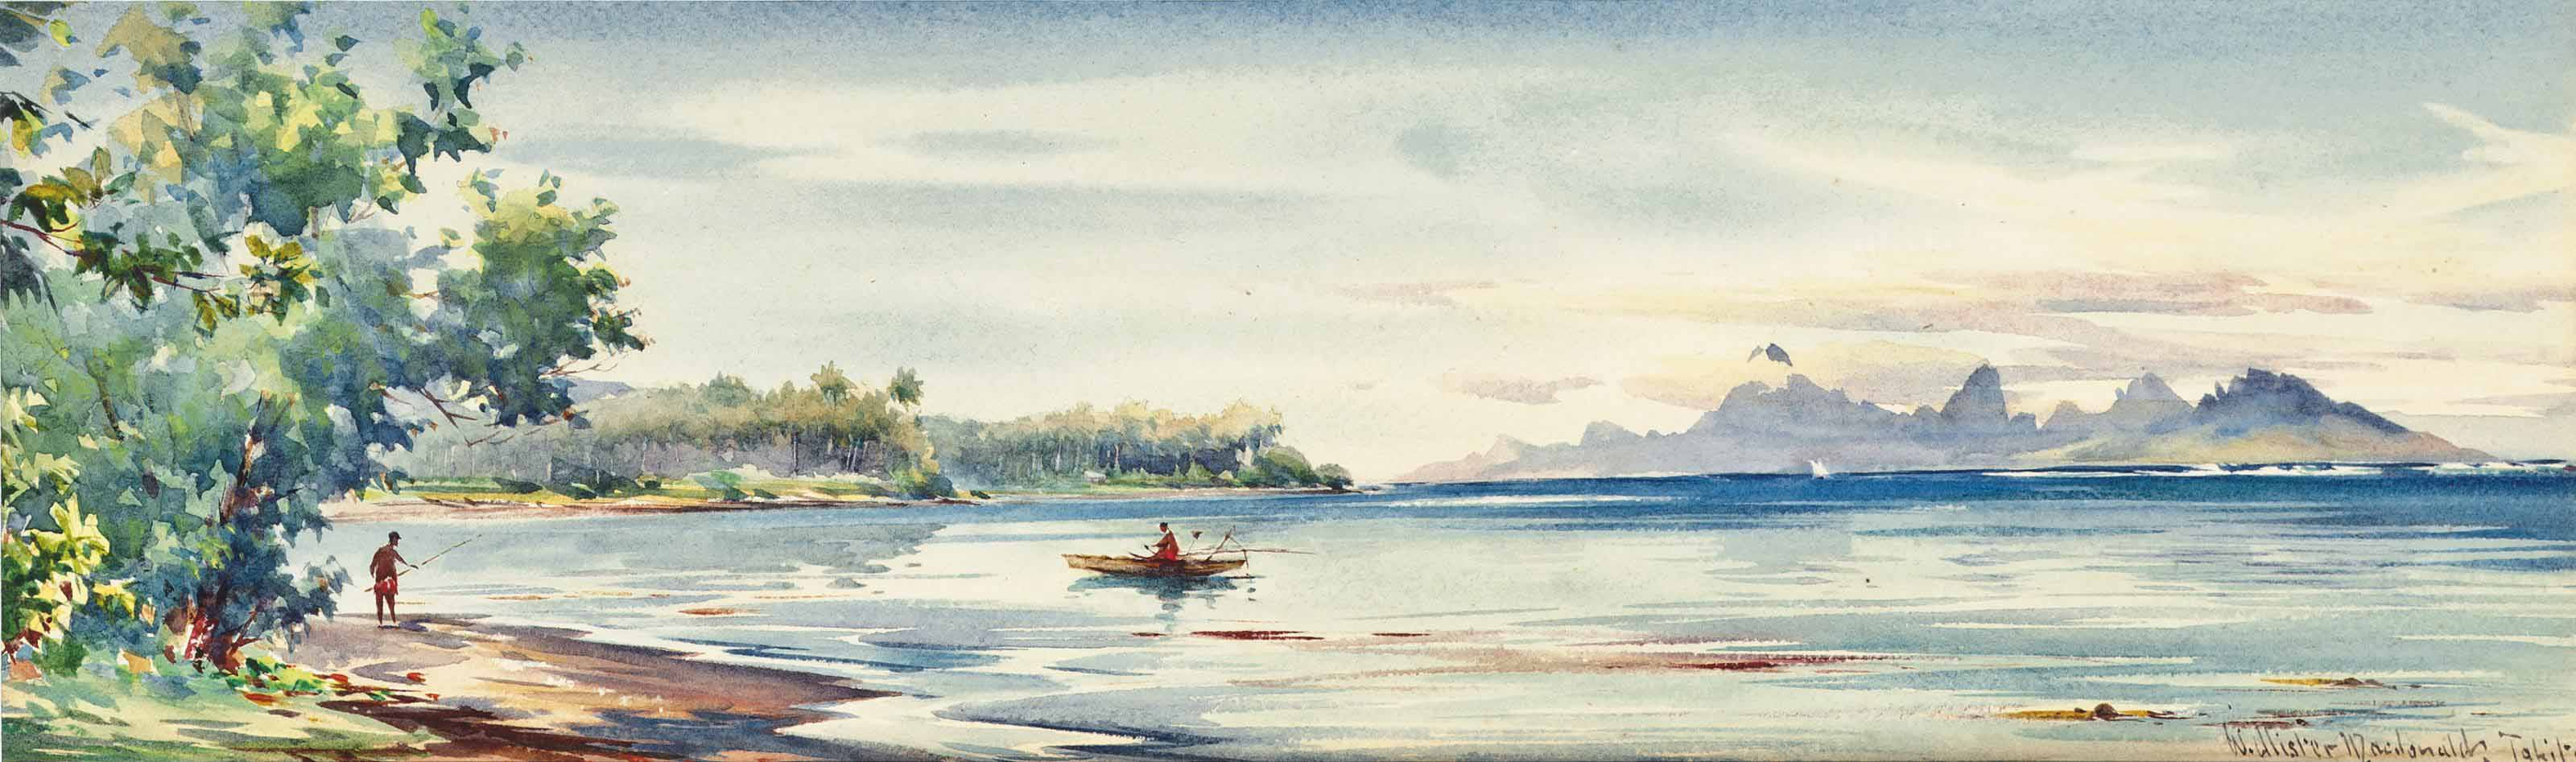 Fisherman in a Bay, Tahiti